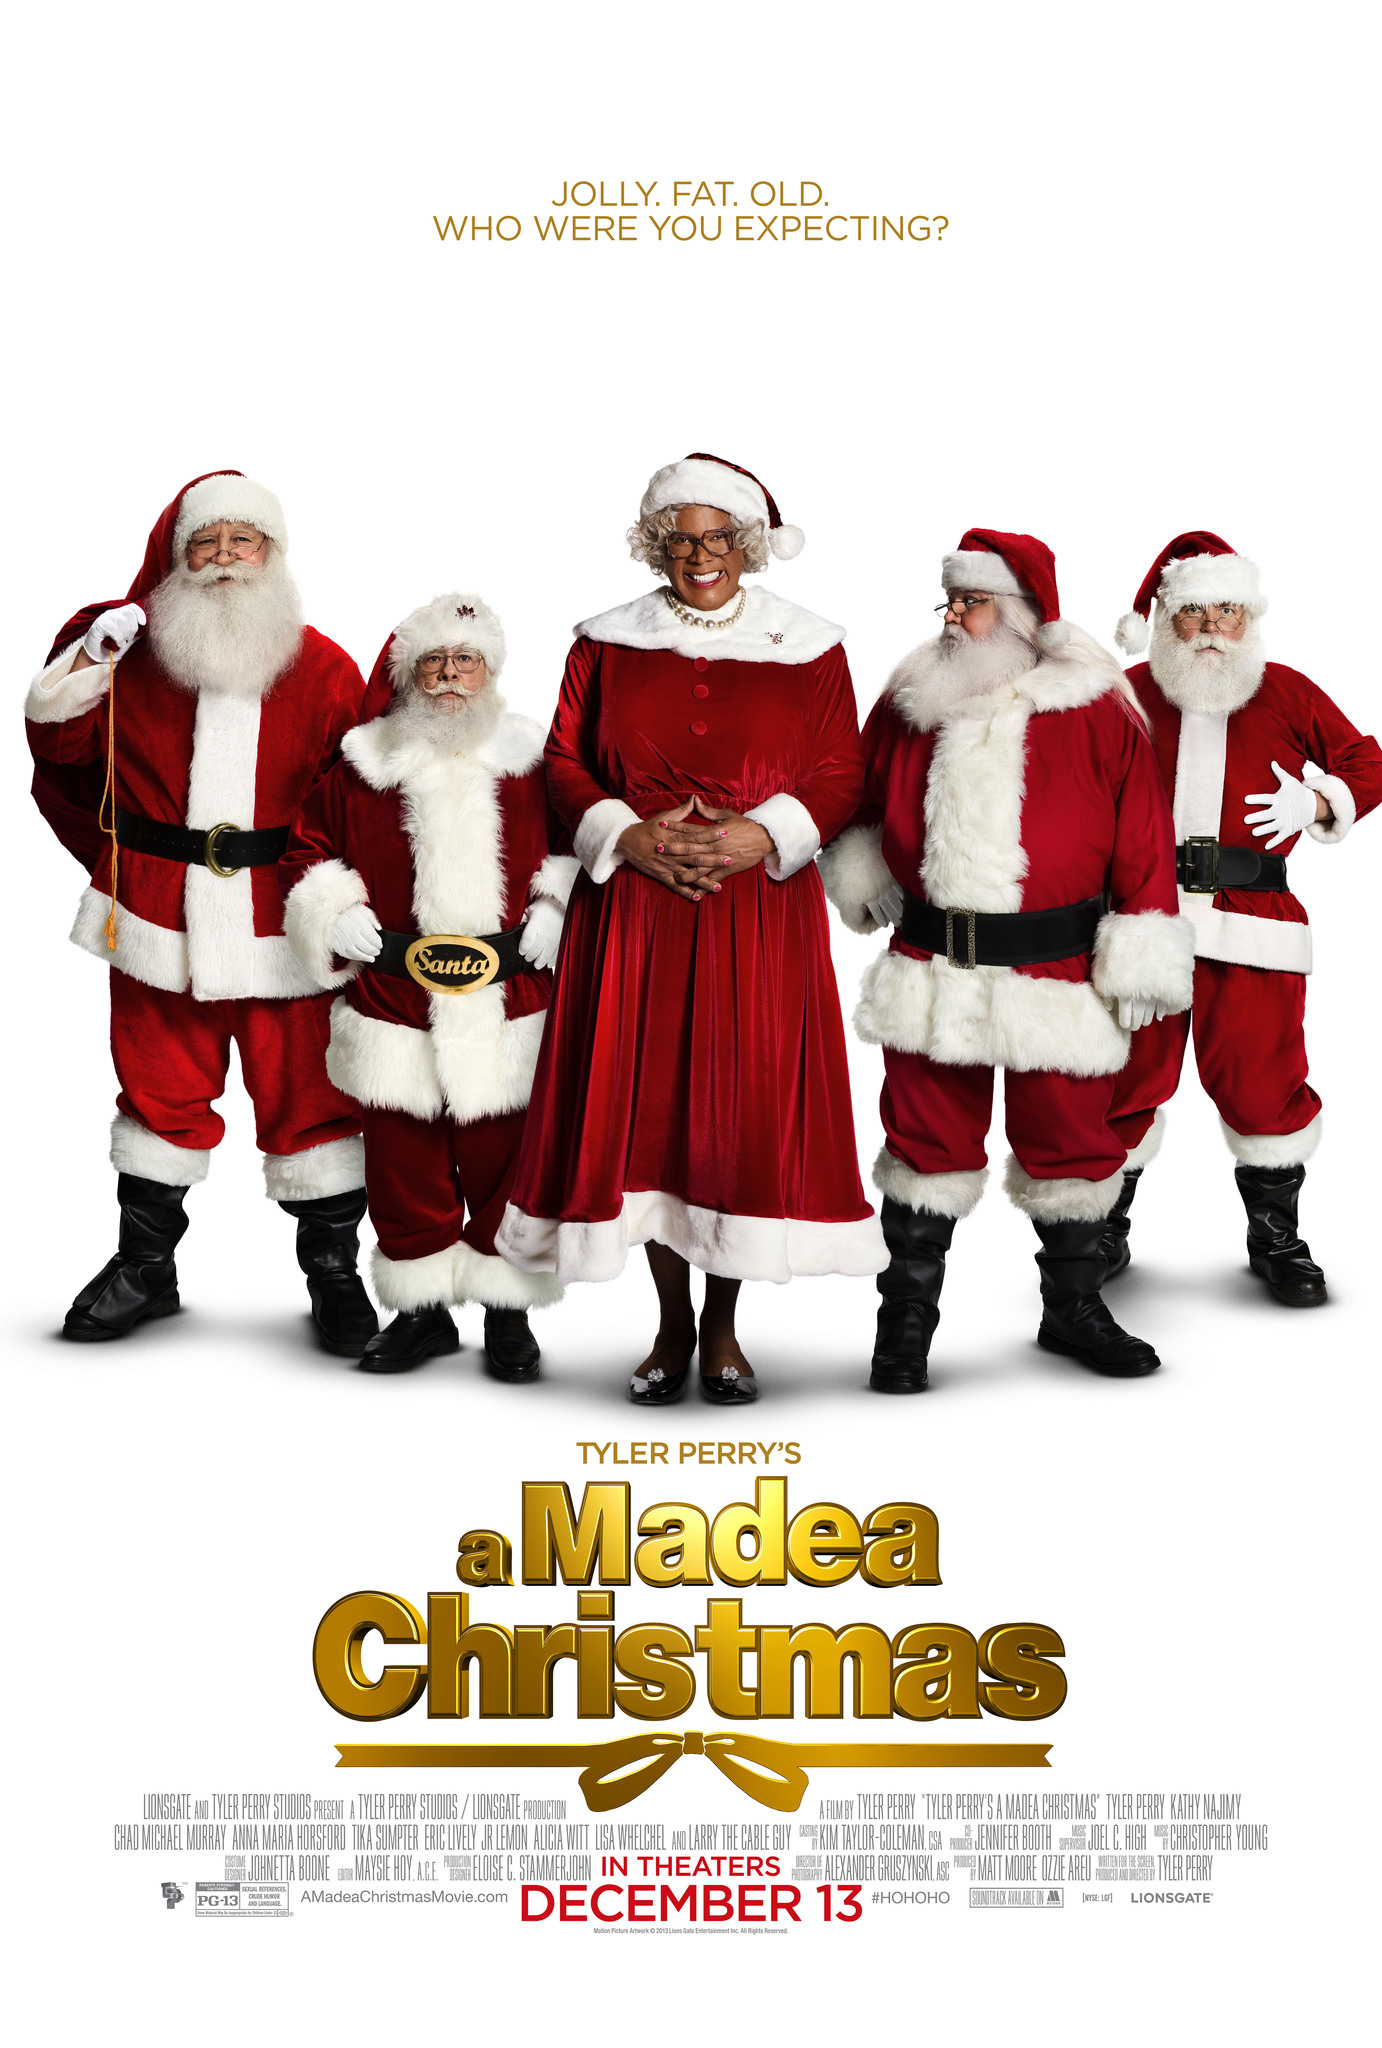 Madea Christmas.A Madea Christmas 2013 Imdb